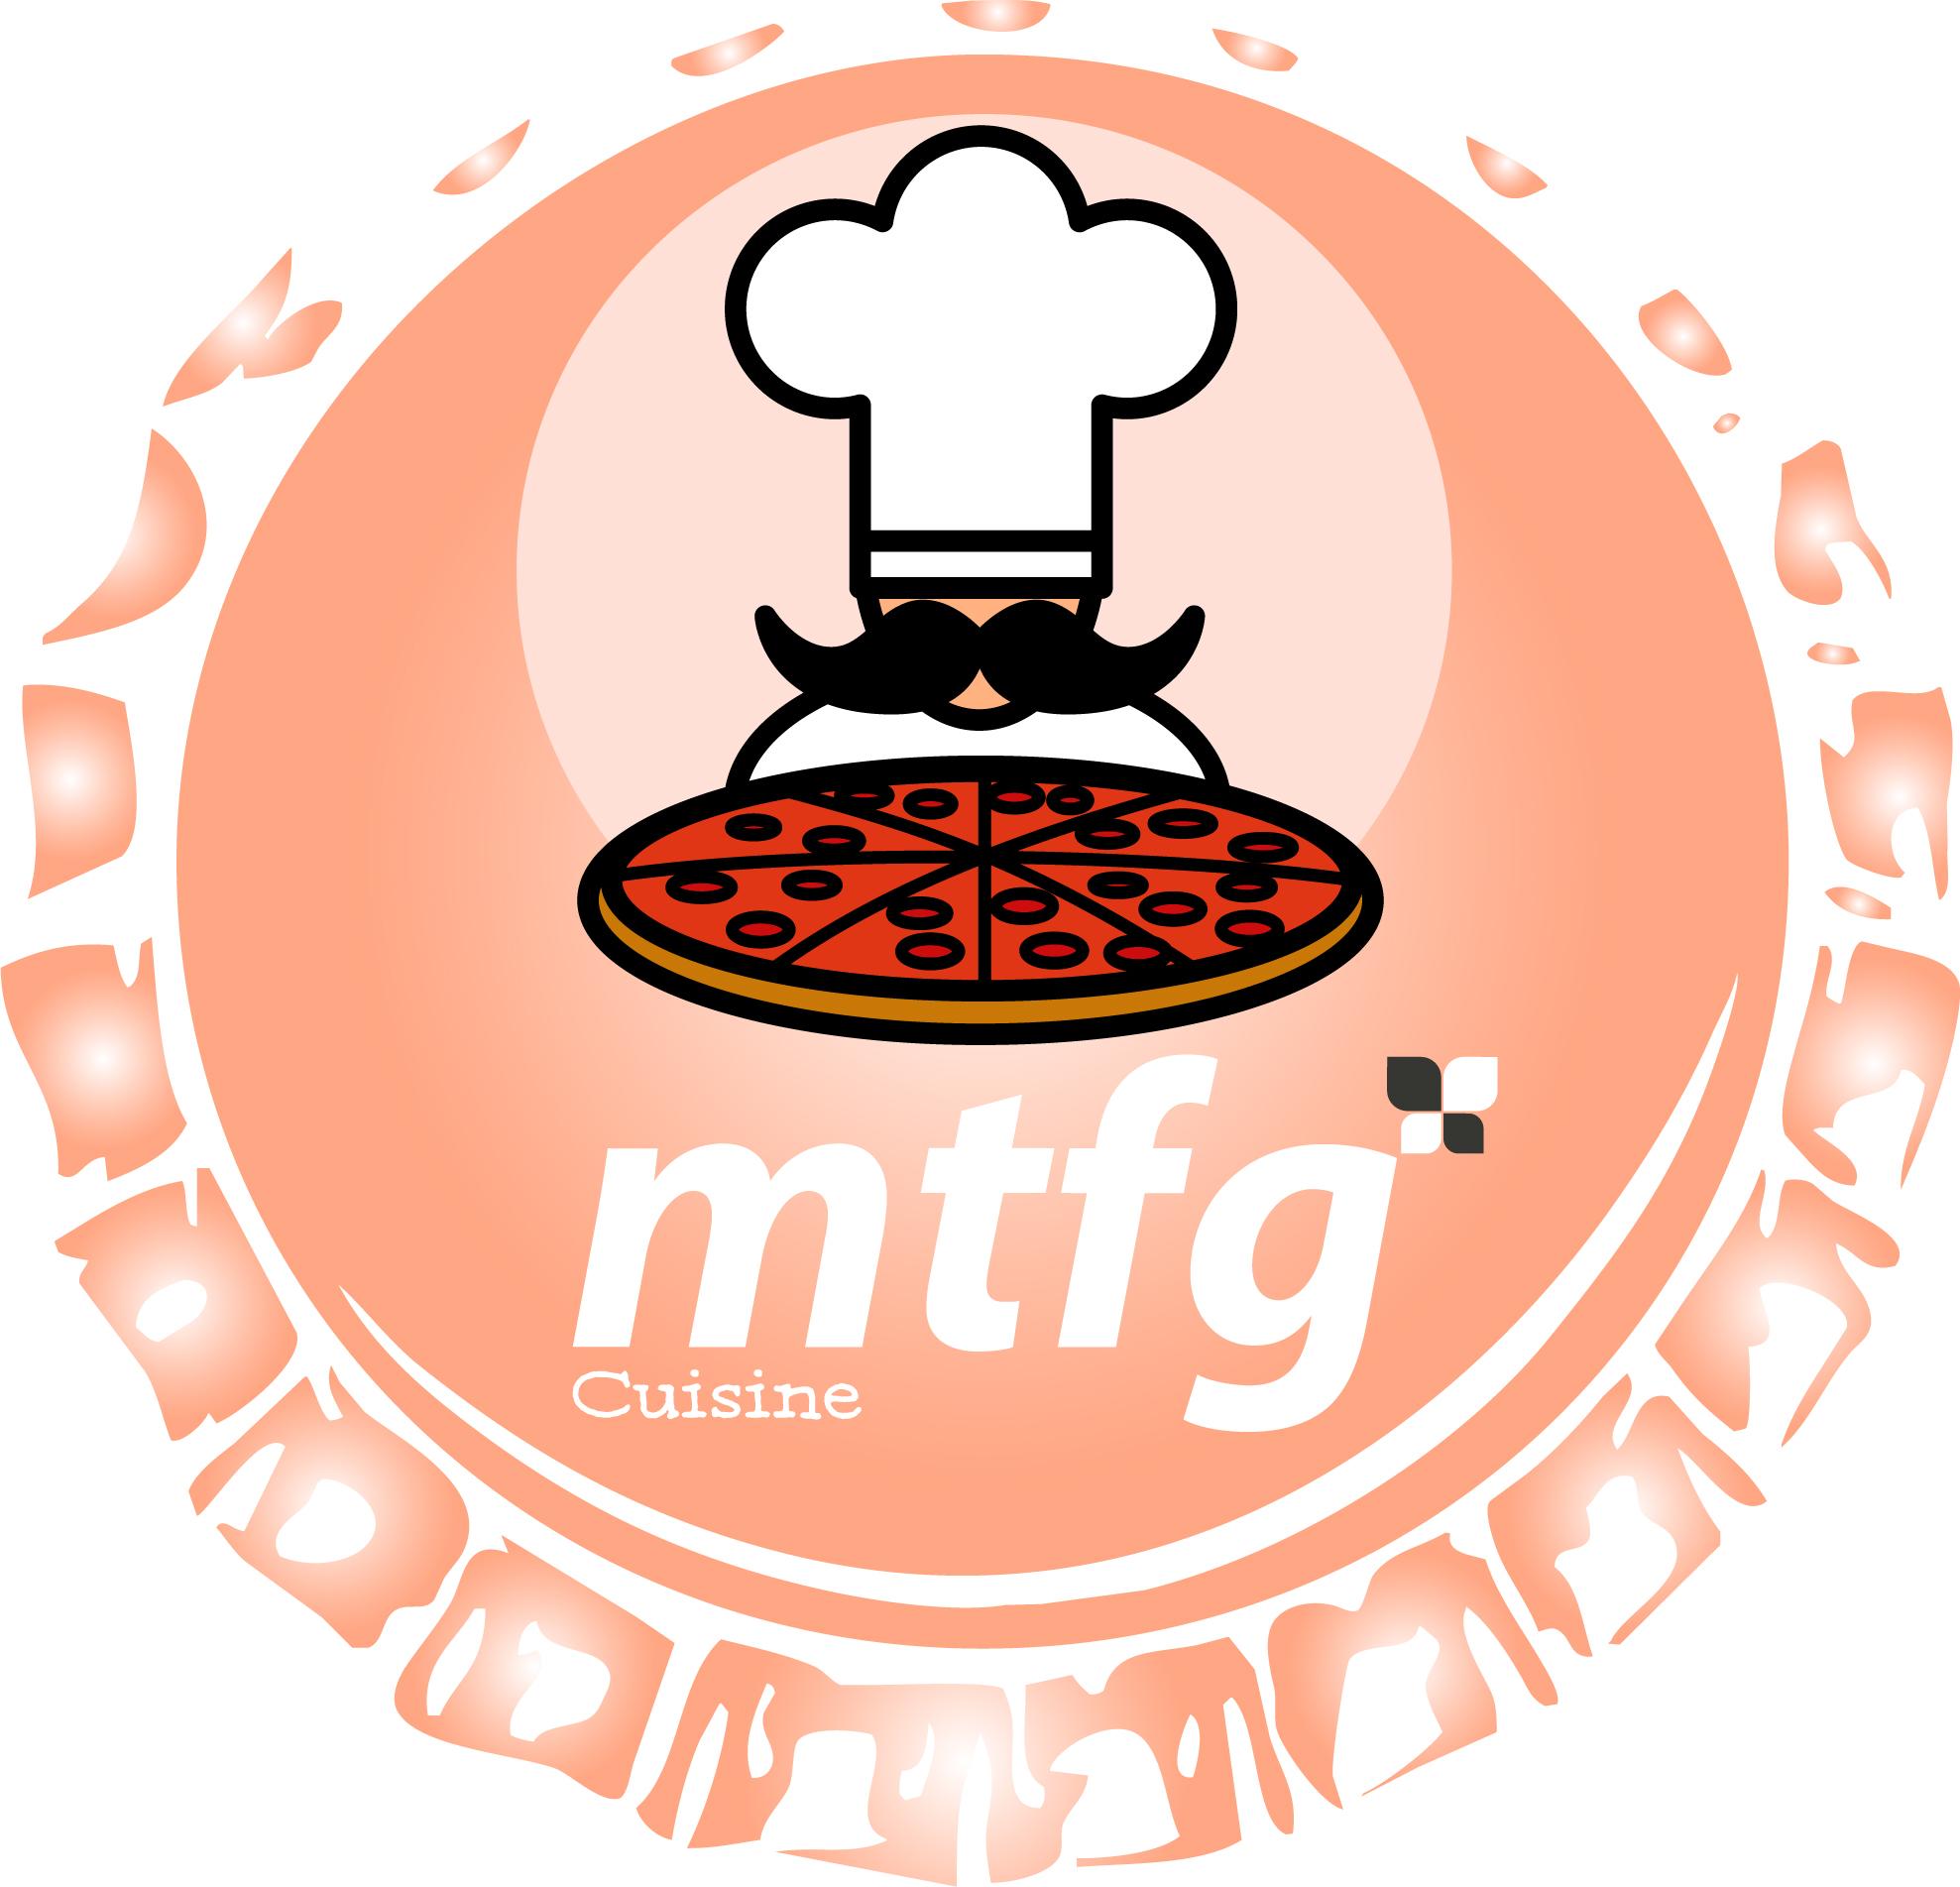 MTFG Cuisine